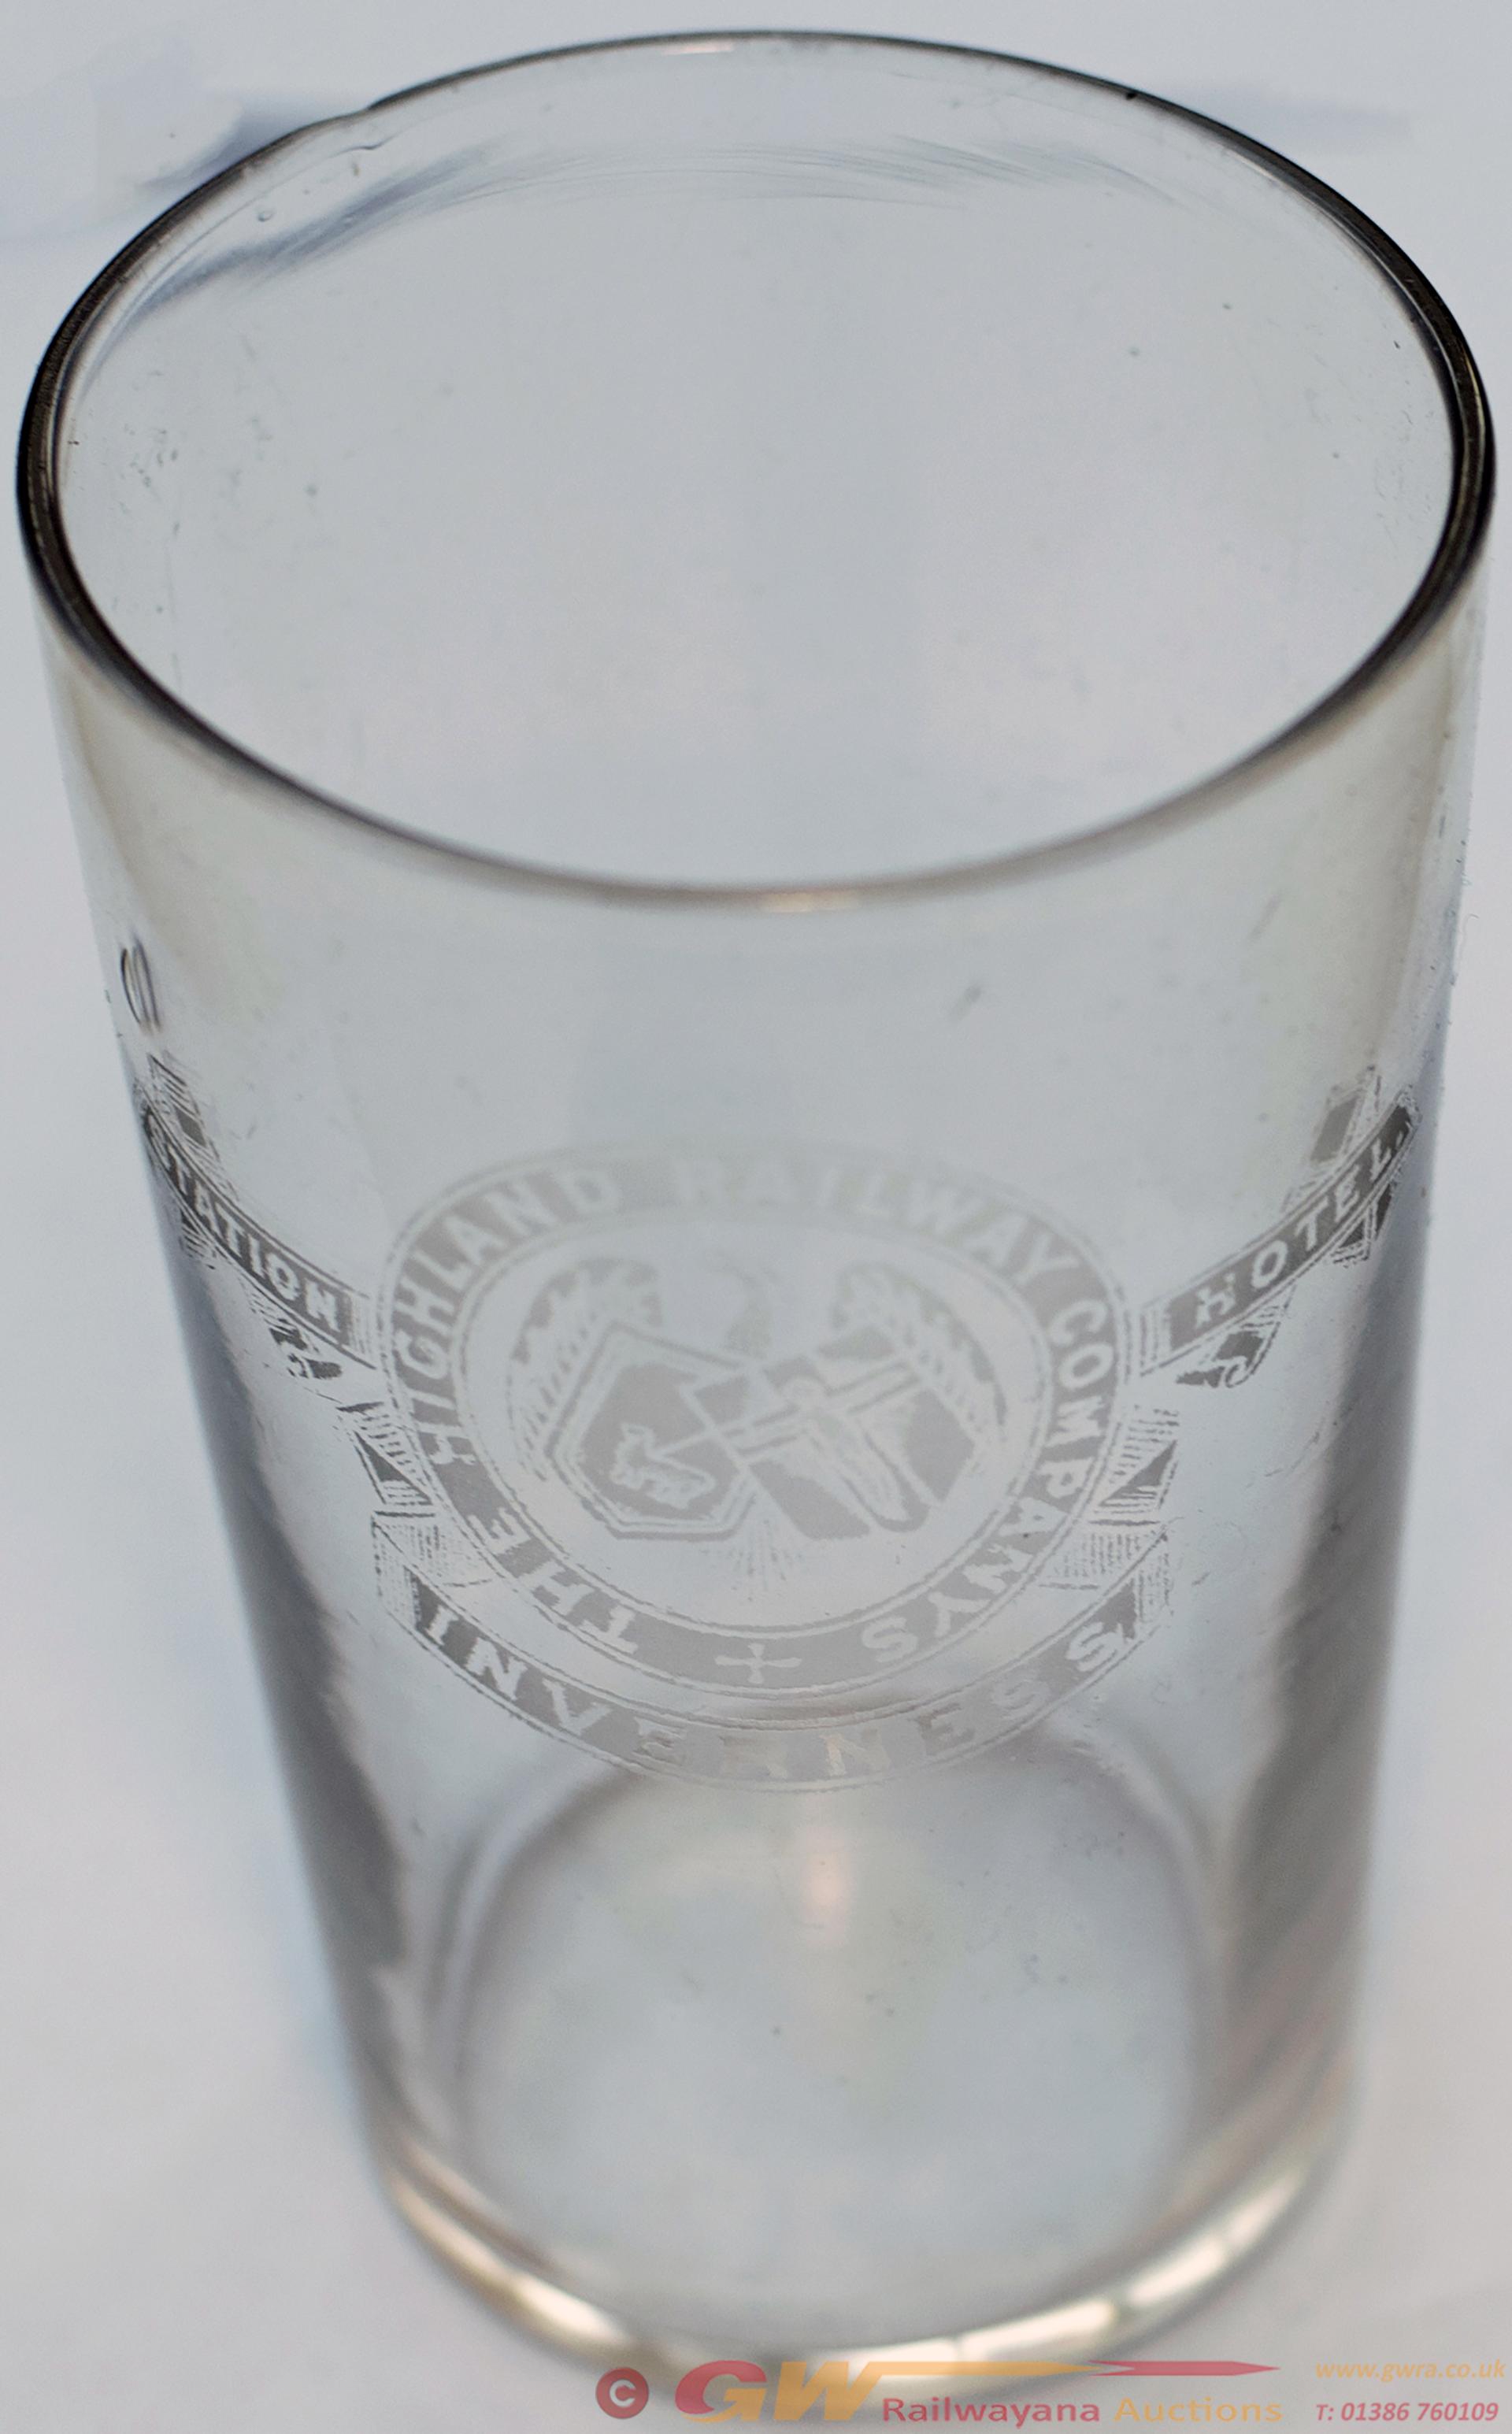 Highland Railway Half Pint Glass Marked On The